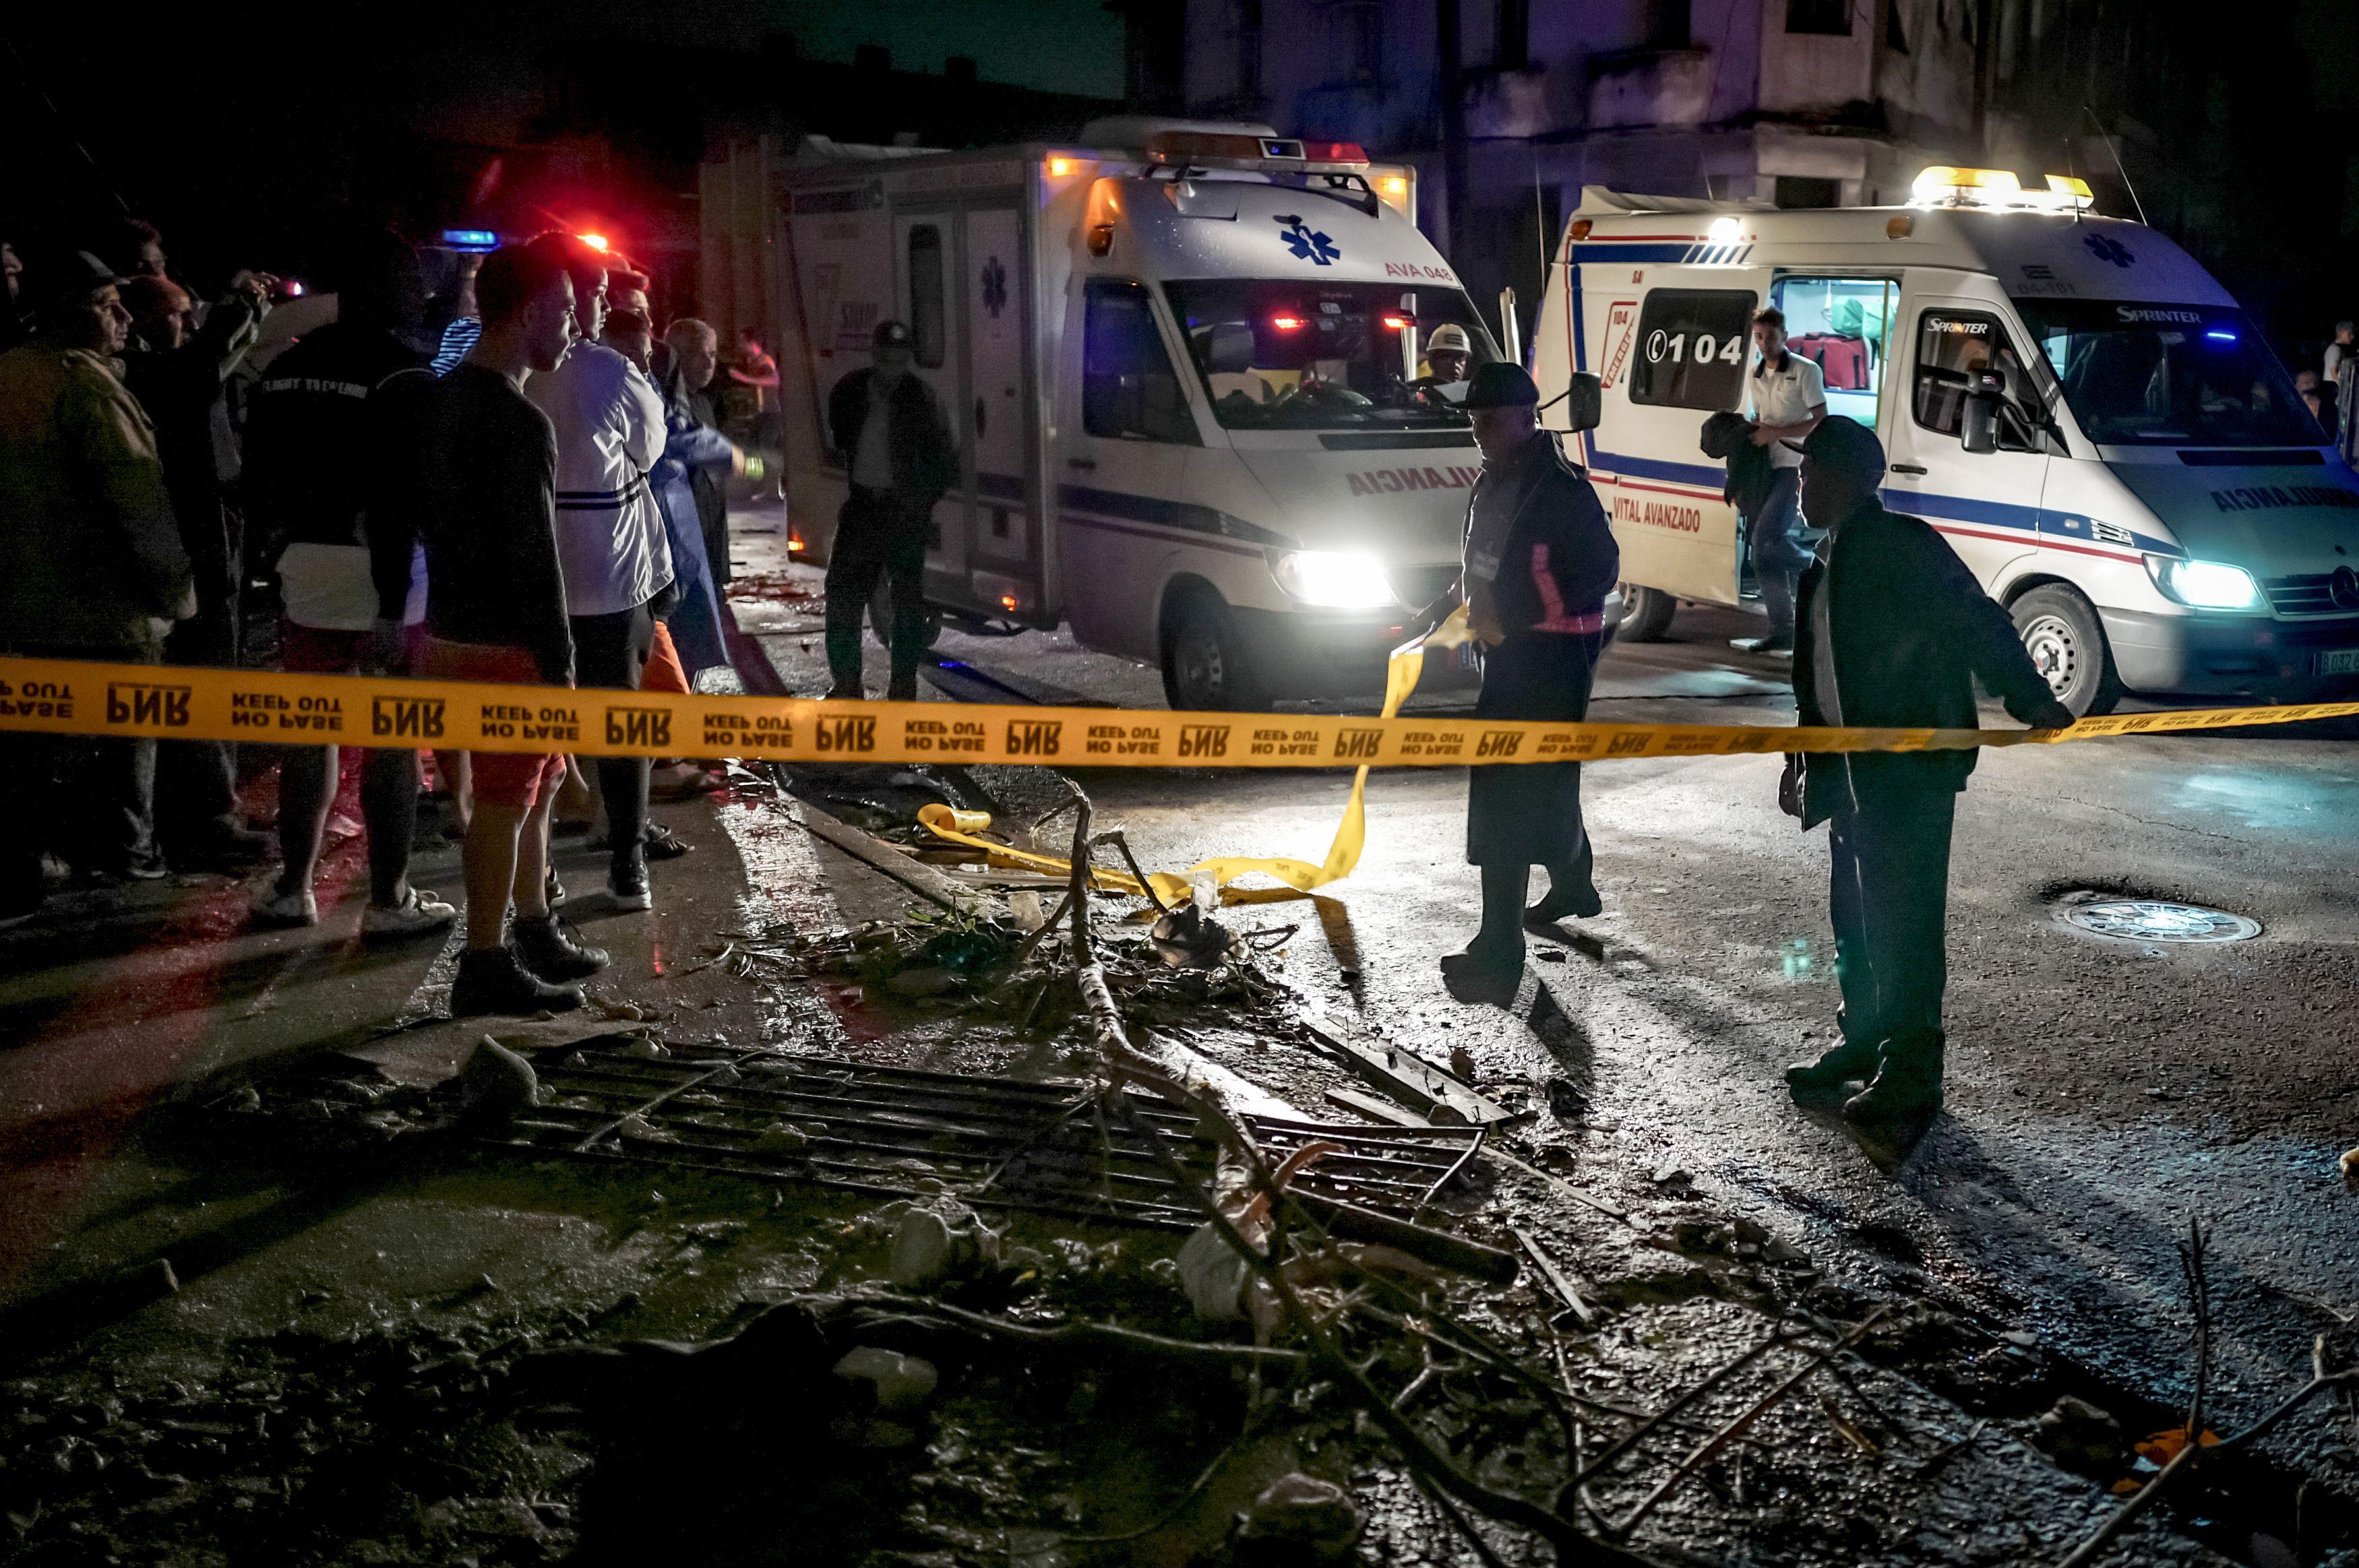 Cuban police cordon off a street in the tornado-hit Luyano neighbourhood in Havana early on January 28, 2019. (ADALBERTO ROQUE/AFP/Getty Images)